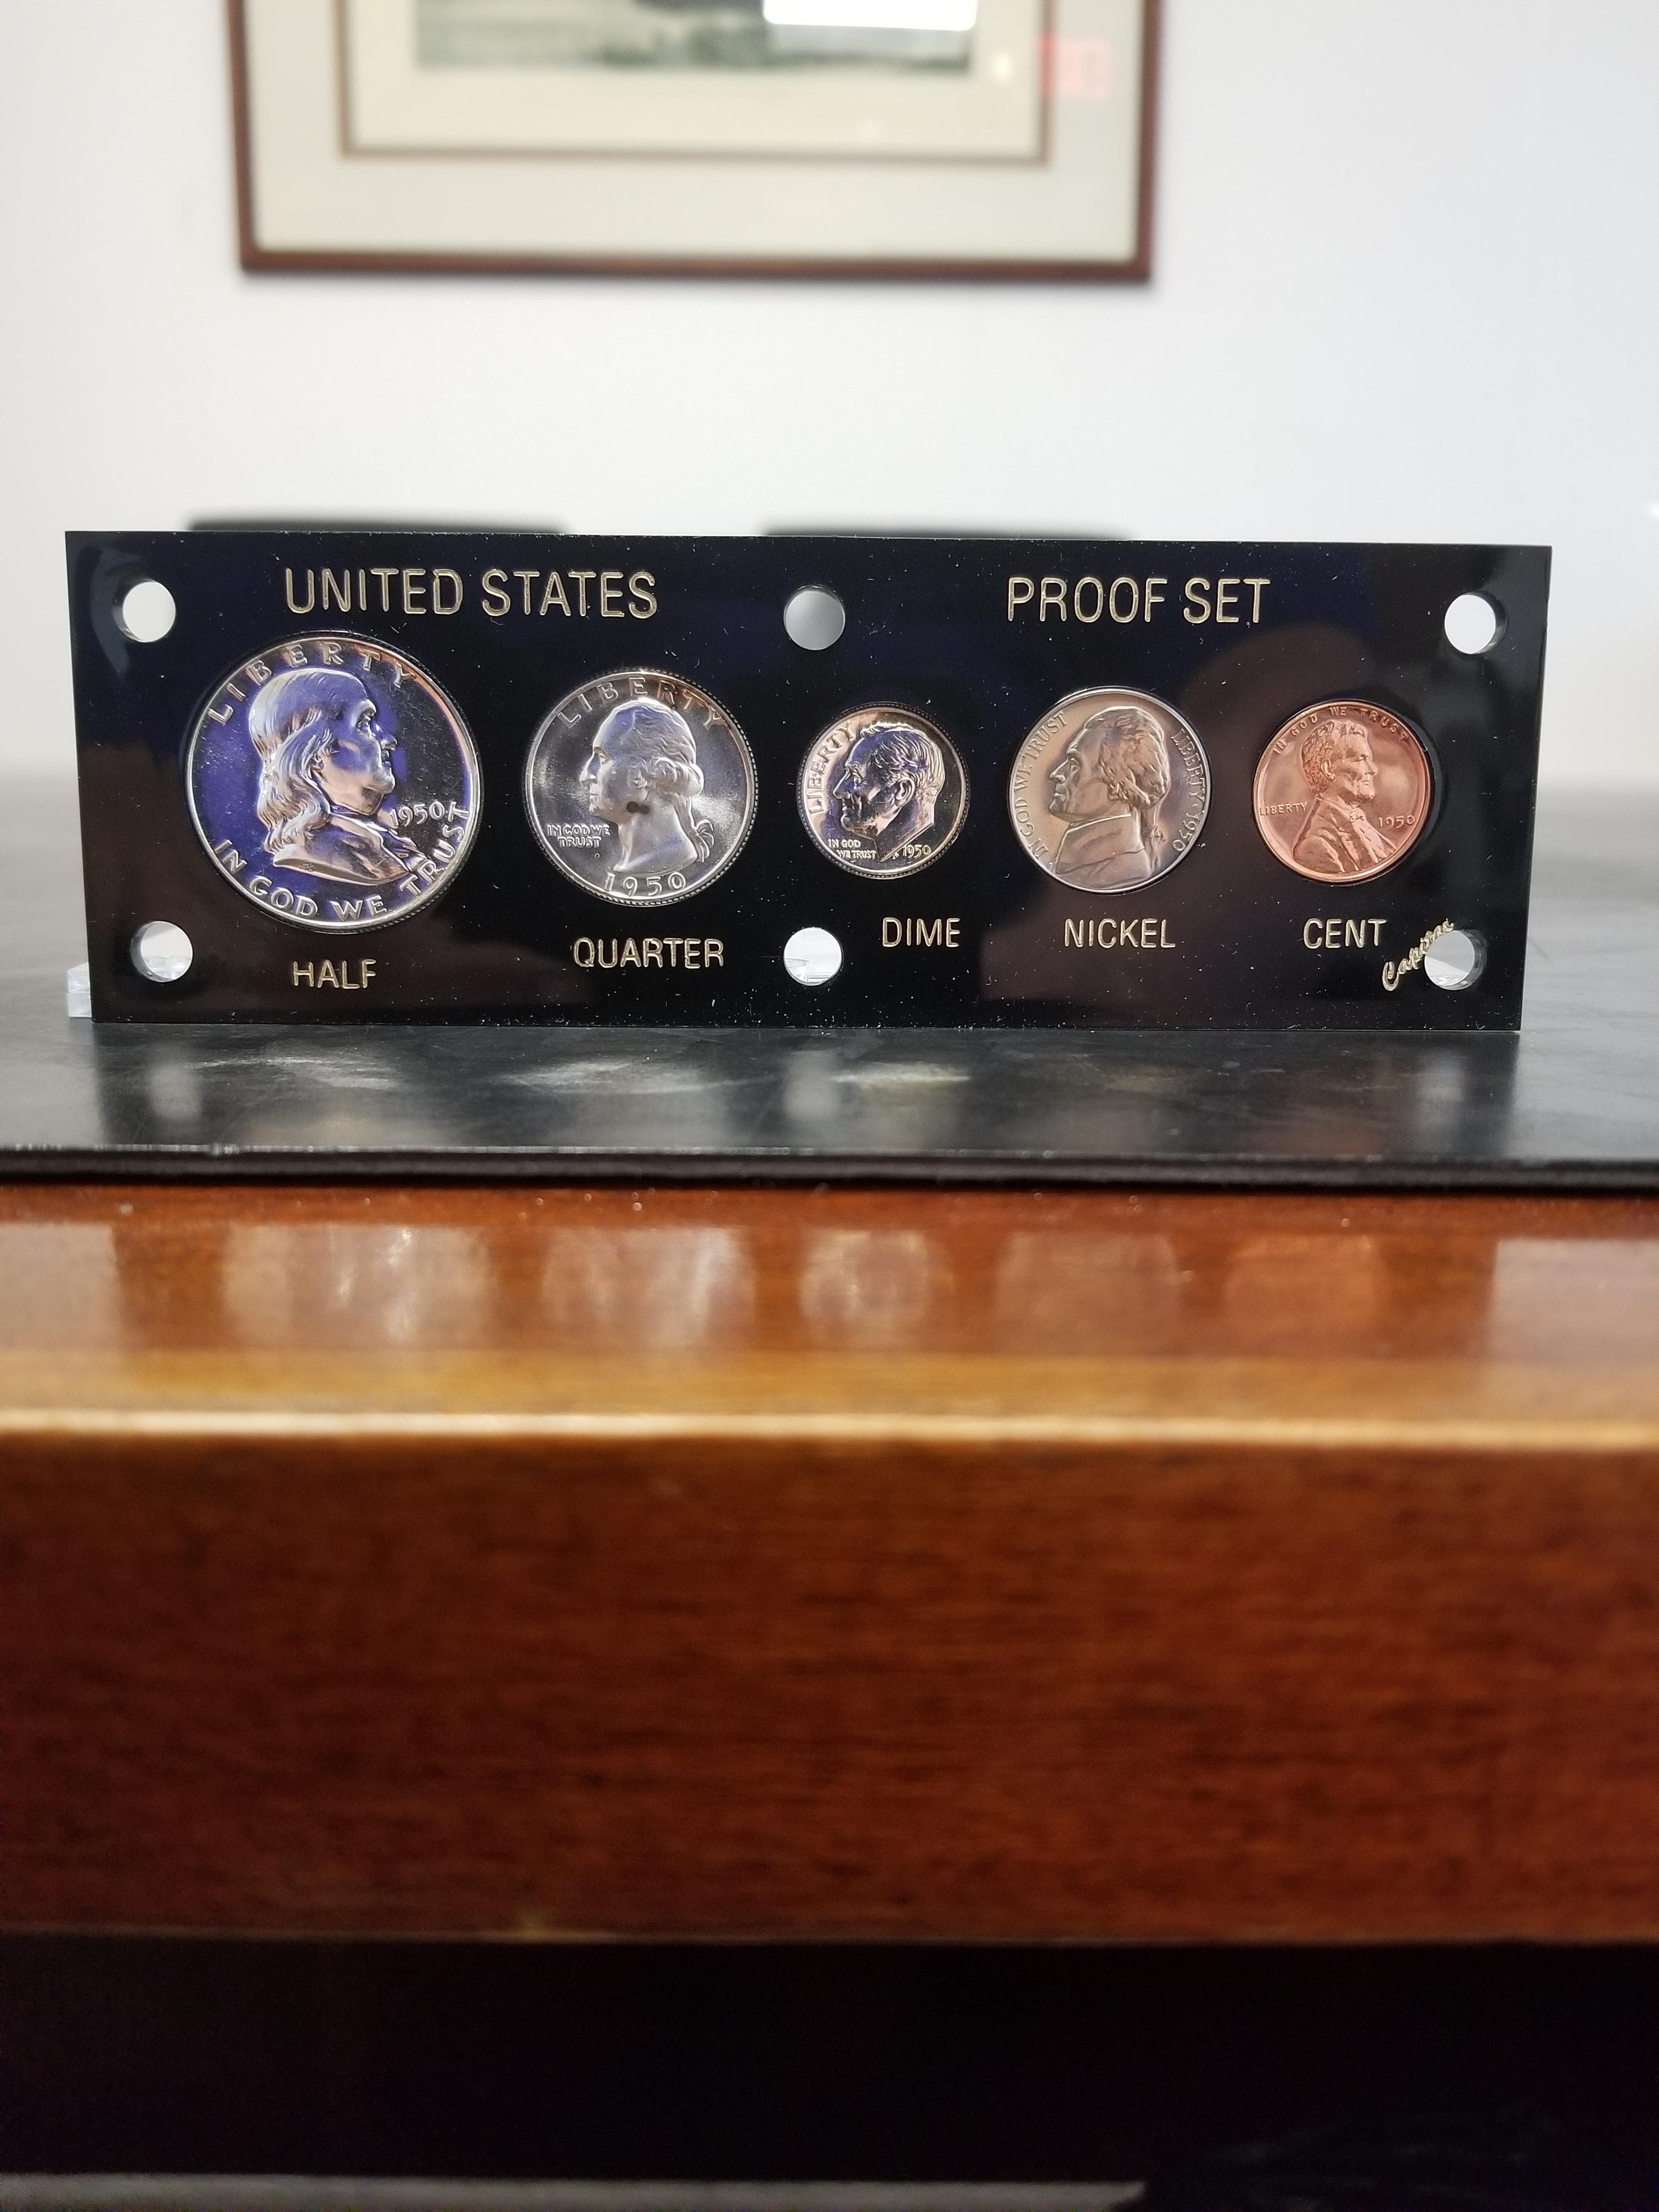 Half Quarter Dime Nickel /& Cent 1997-S US Proof Set